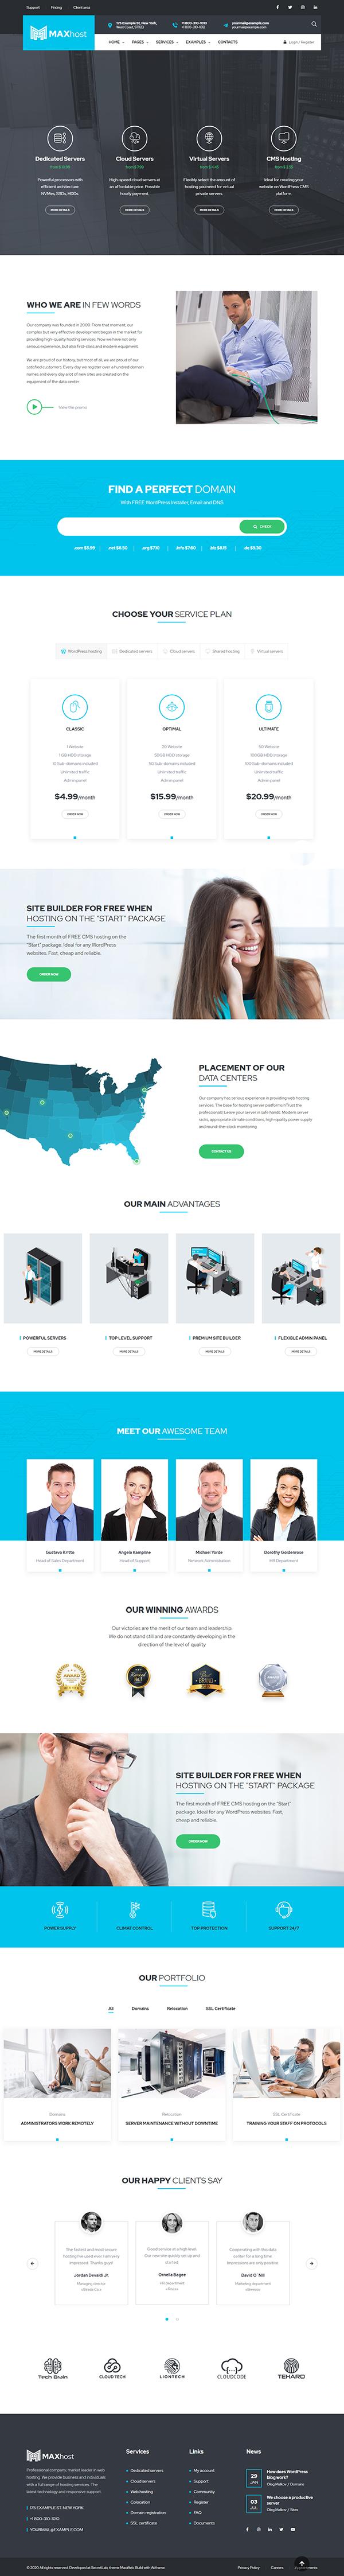 MaxWeb - Hosting & SEO Agency WordPress Theme